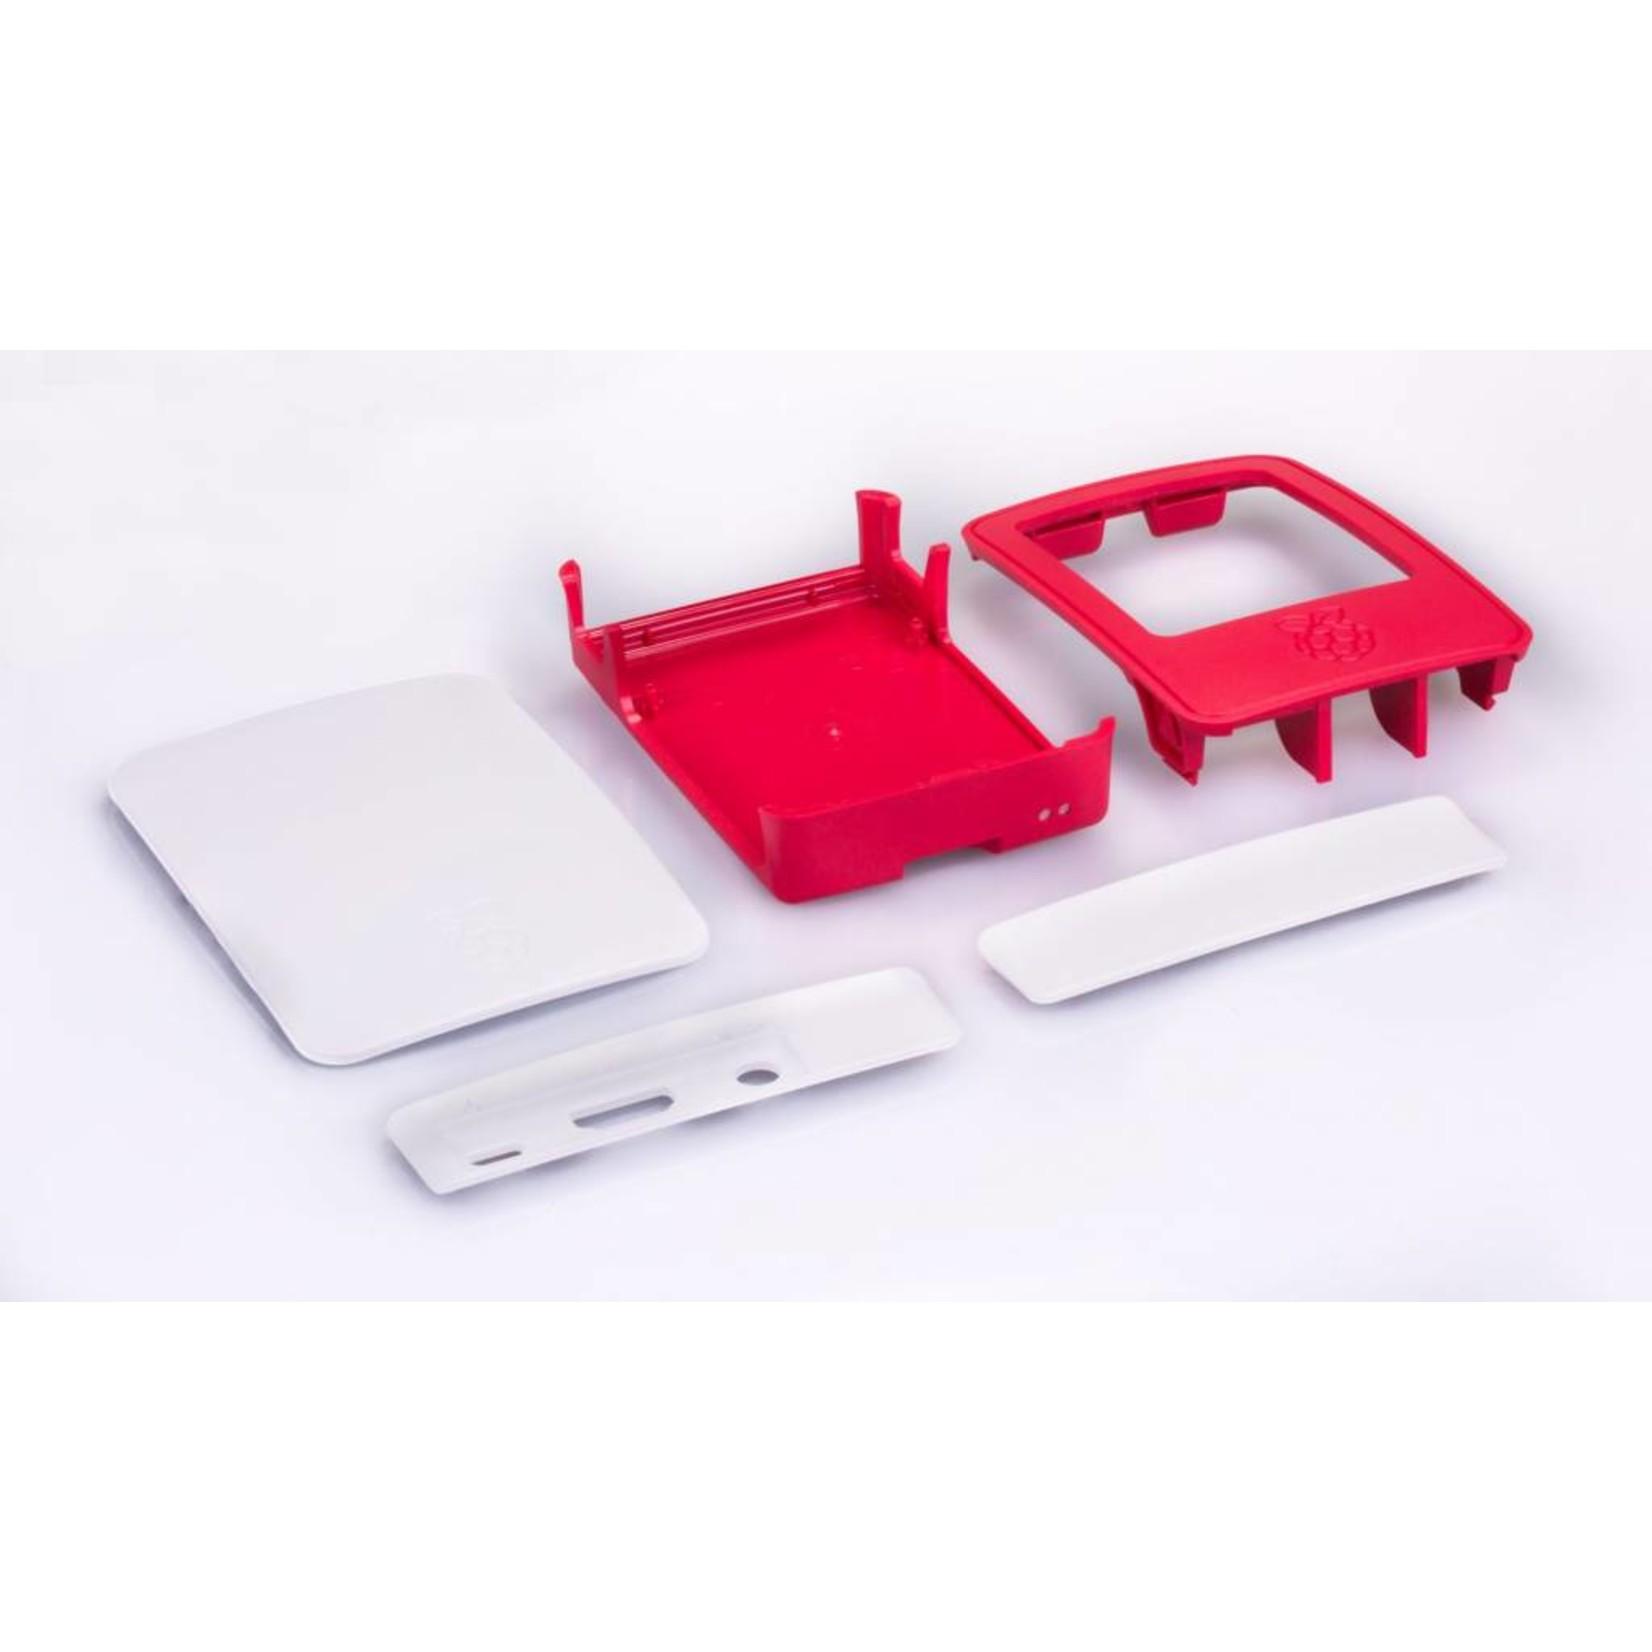 Raspberry Pi Behuizing voor Raspberry Pi 3B(+)  - Rood/Wit